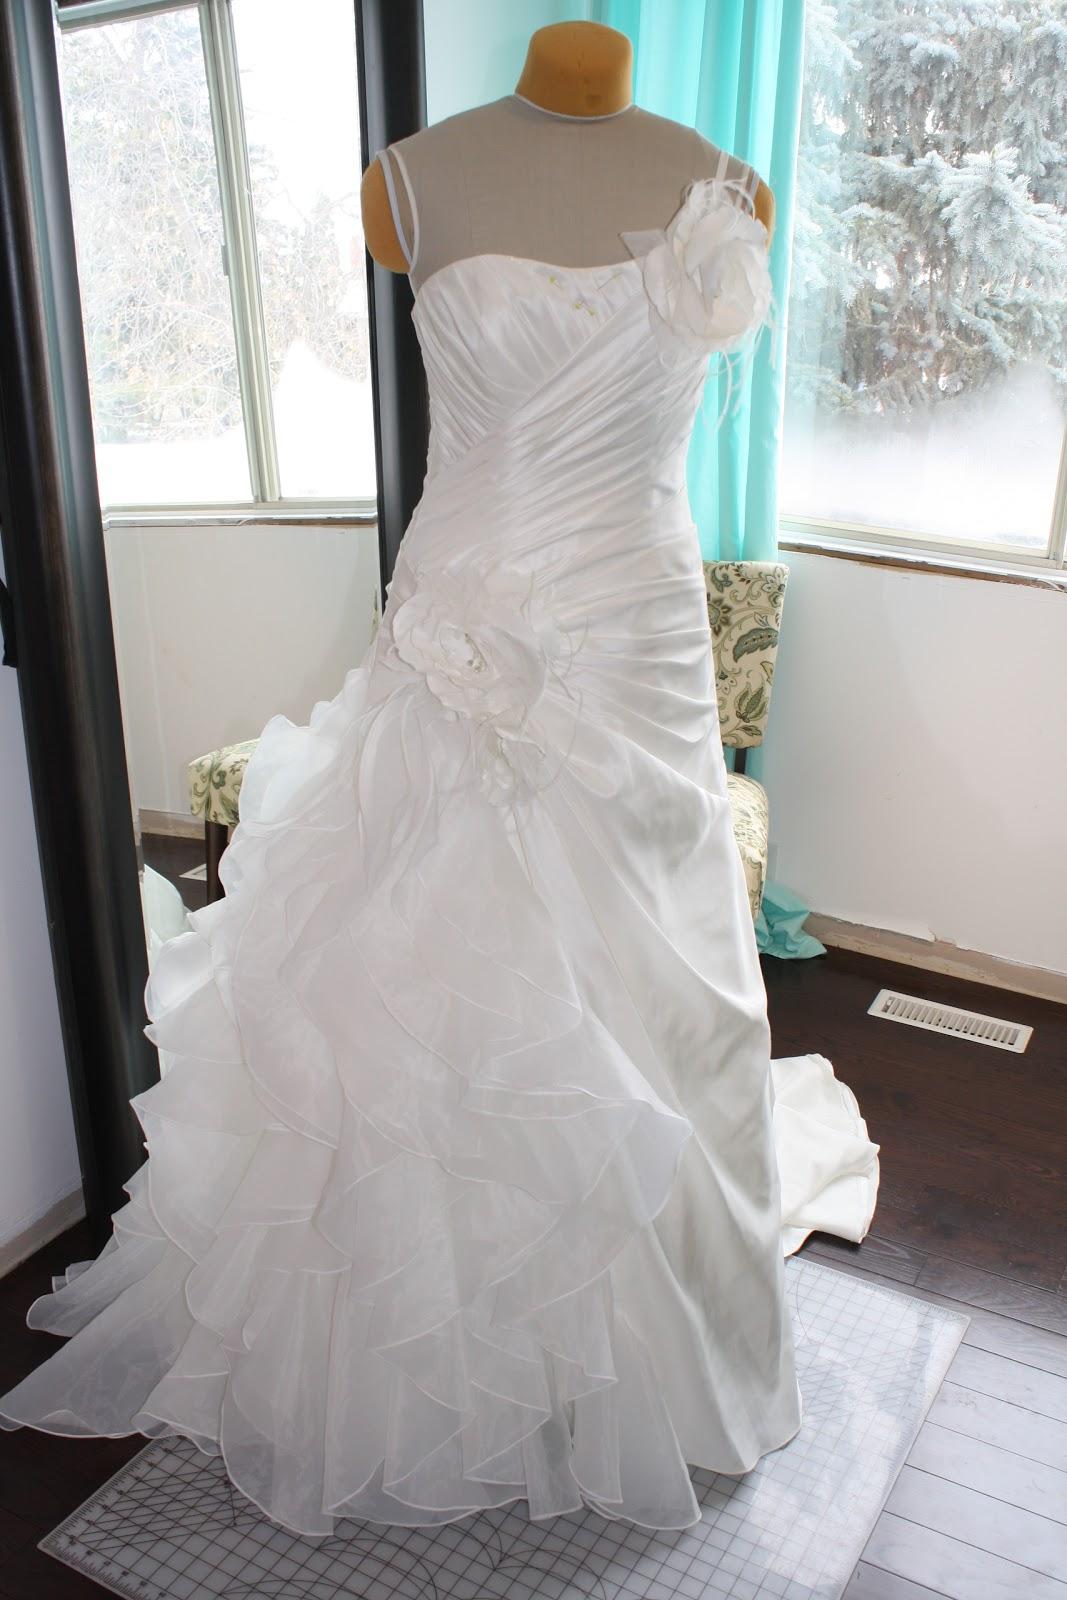 Banclothing Changing A Wedding Dress Neckline